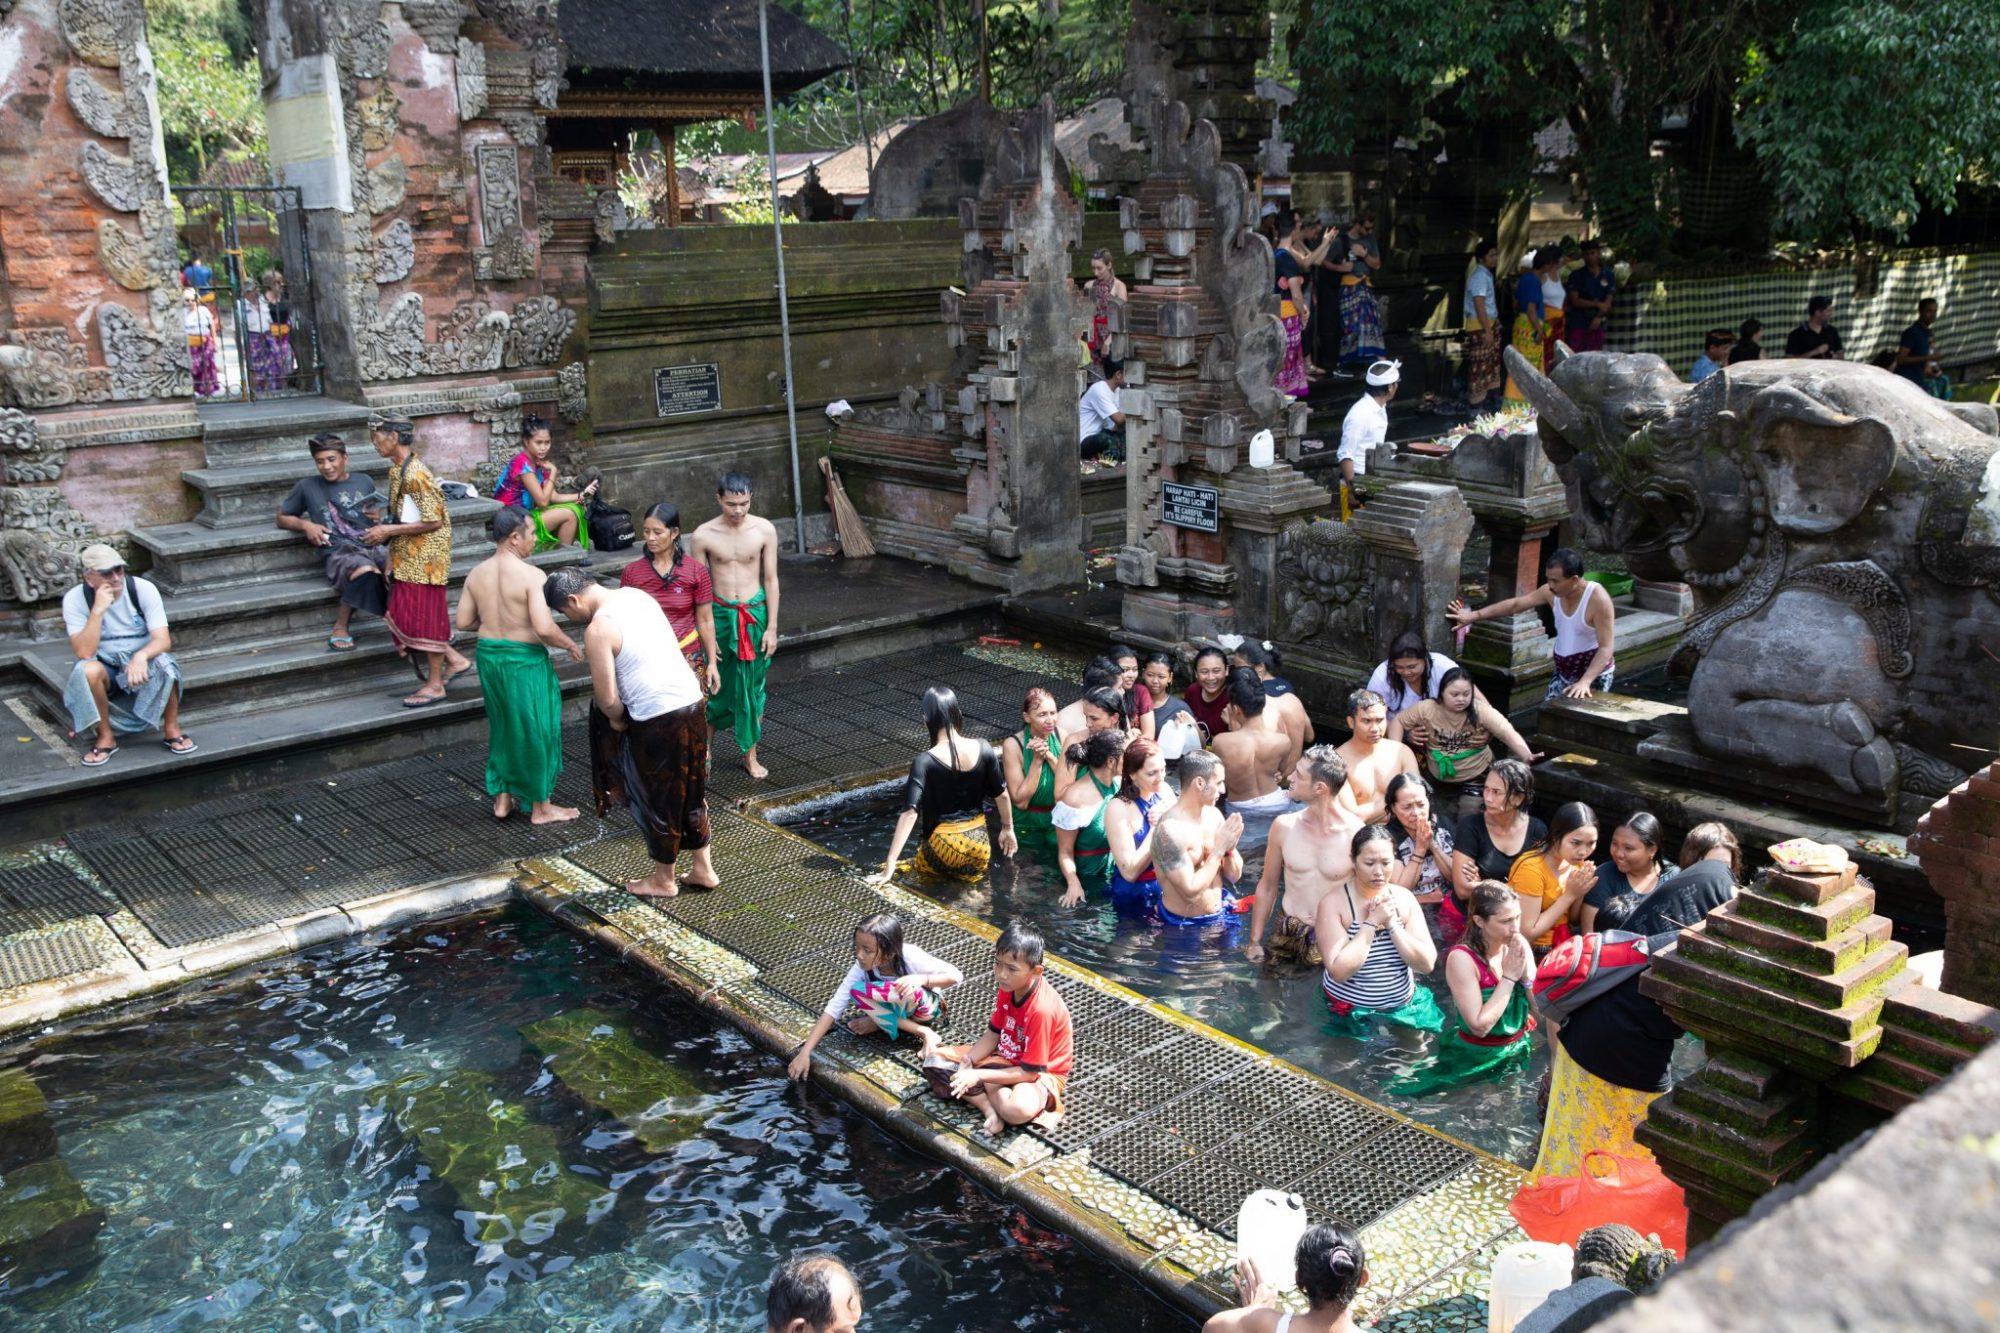 tirta empul bali, bali travel guide, where to avoid in bali